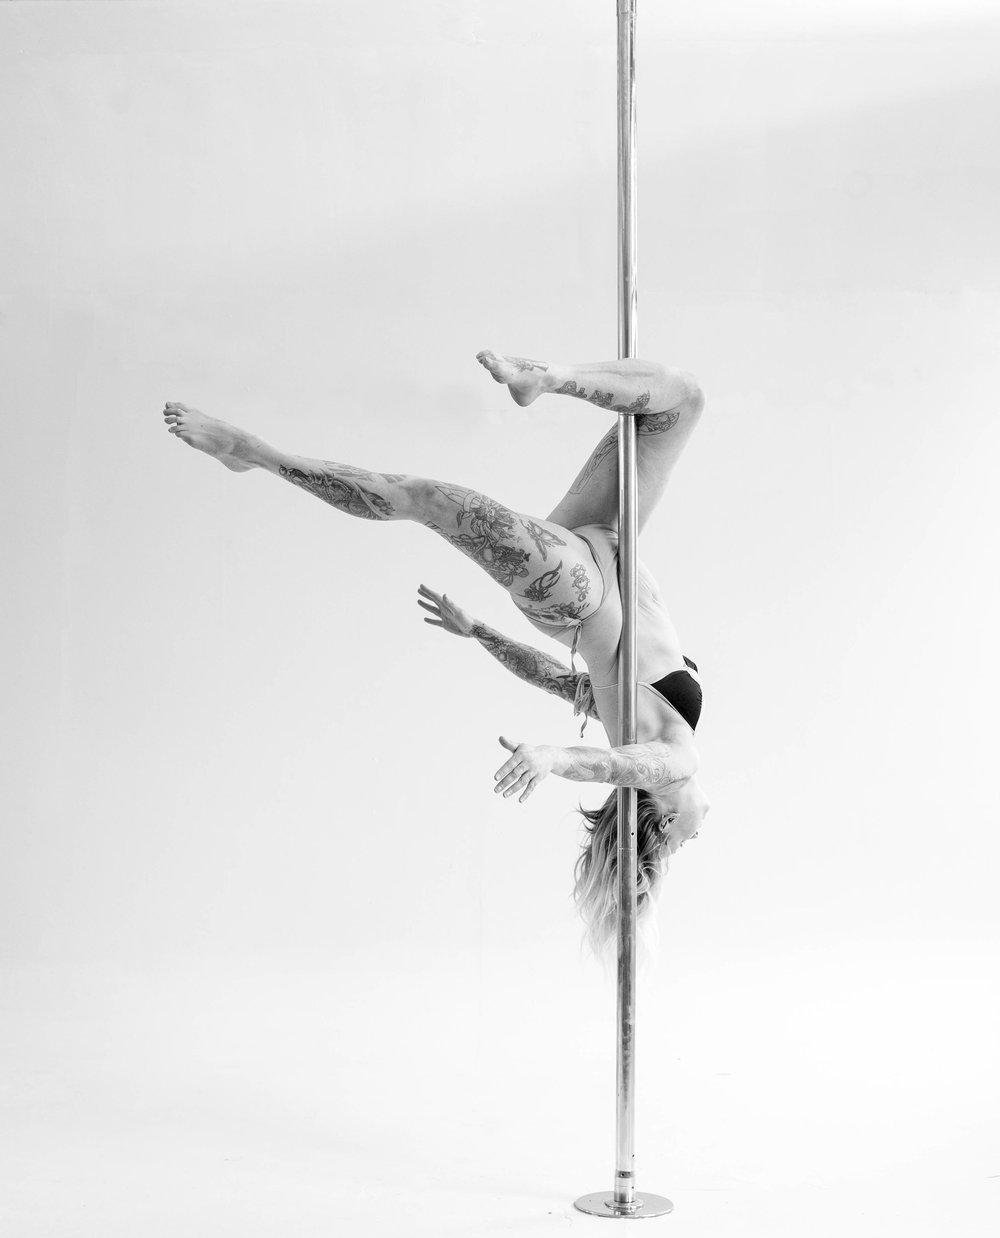 Lauren, balletic pole and aerial dancer, Stockport UK.